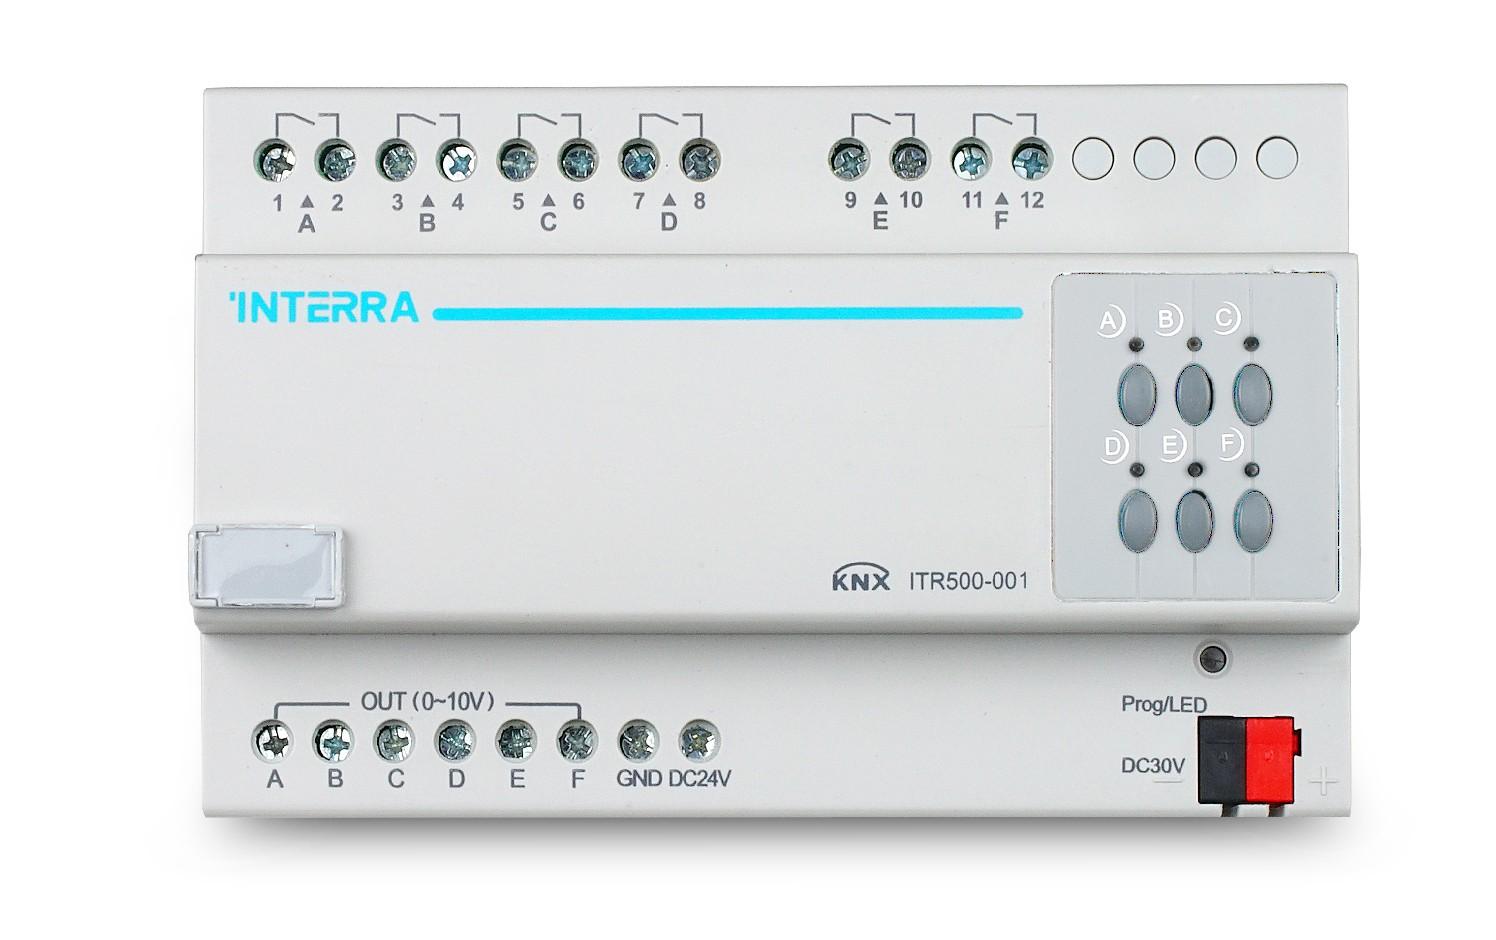 6 CH 10A Ballast Controller